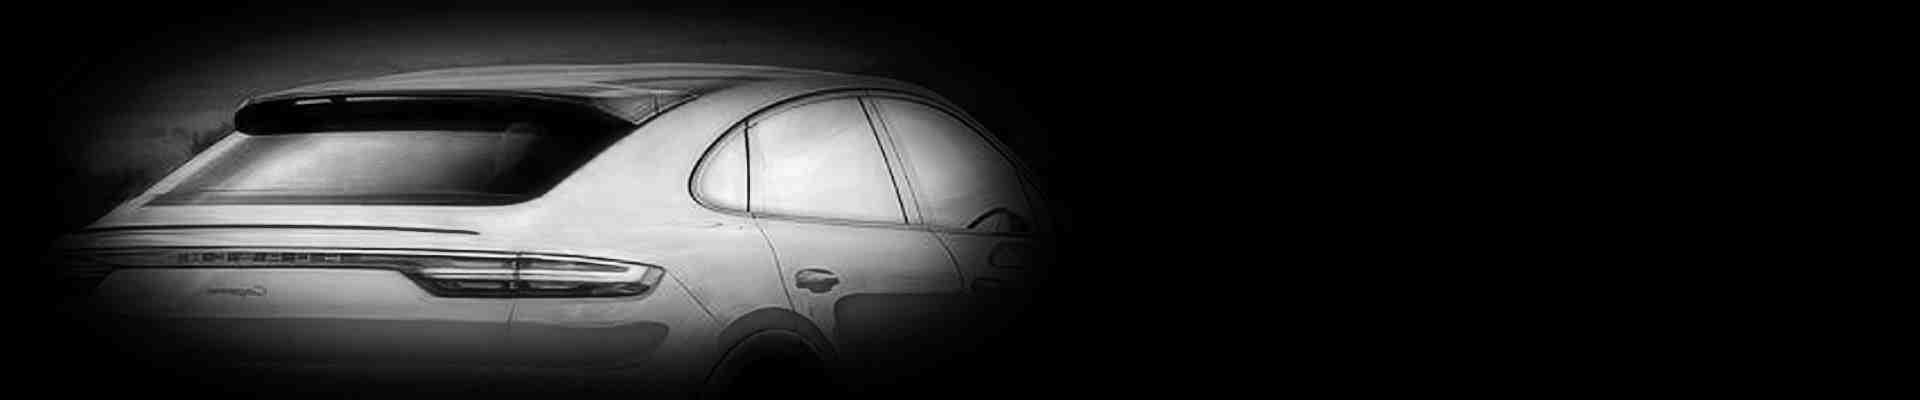 RIMAPPATURA PORSCHE CAYENNE COUPE' 3.0T V6 340 CV